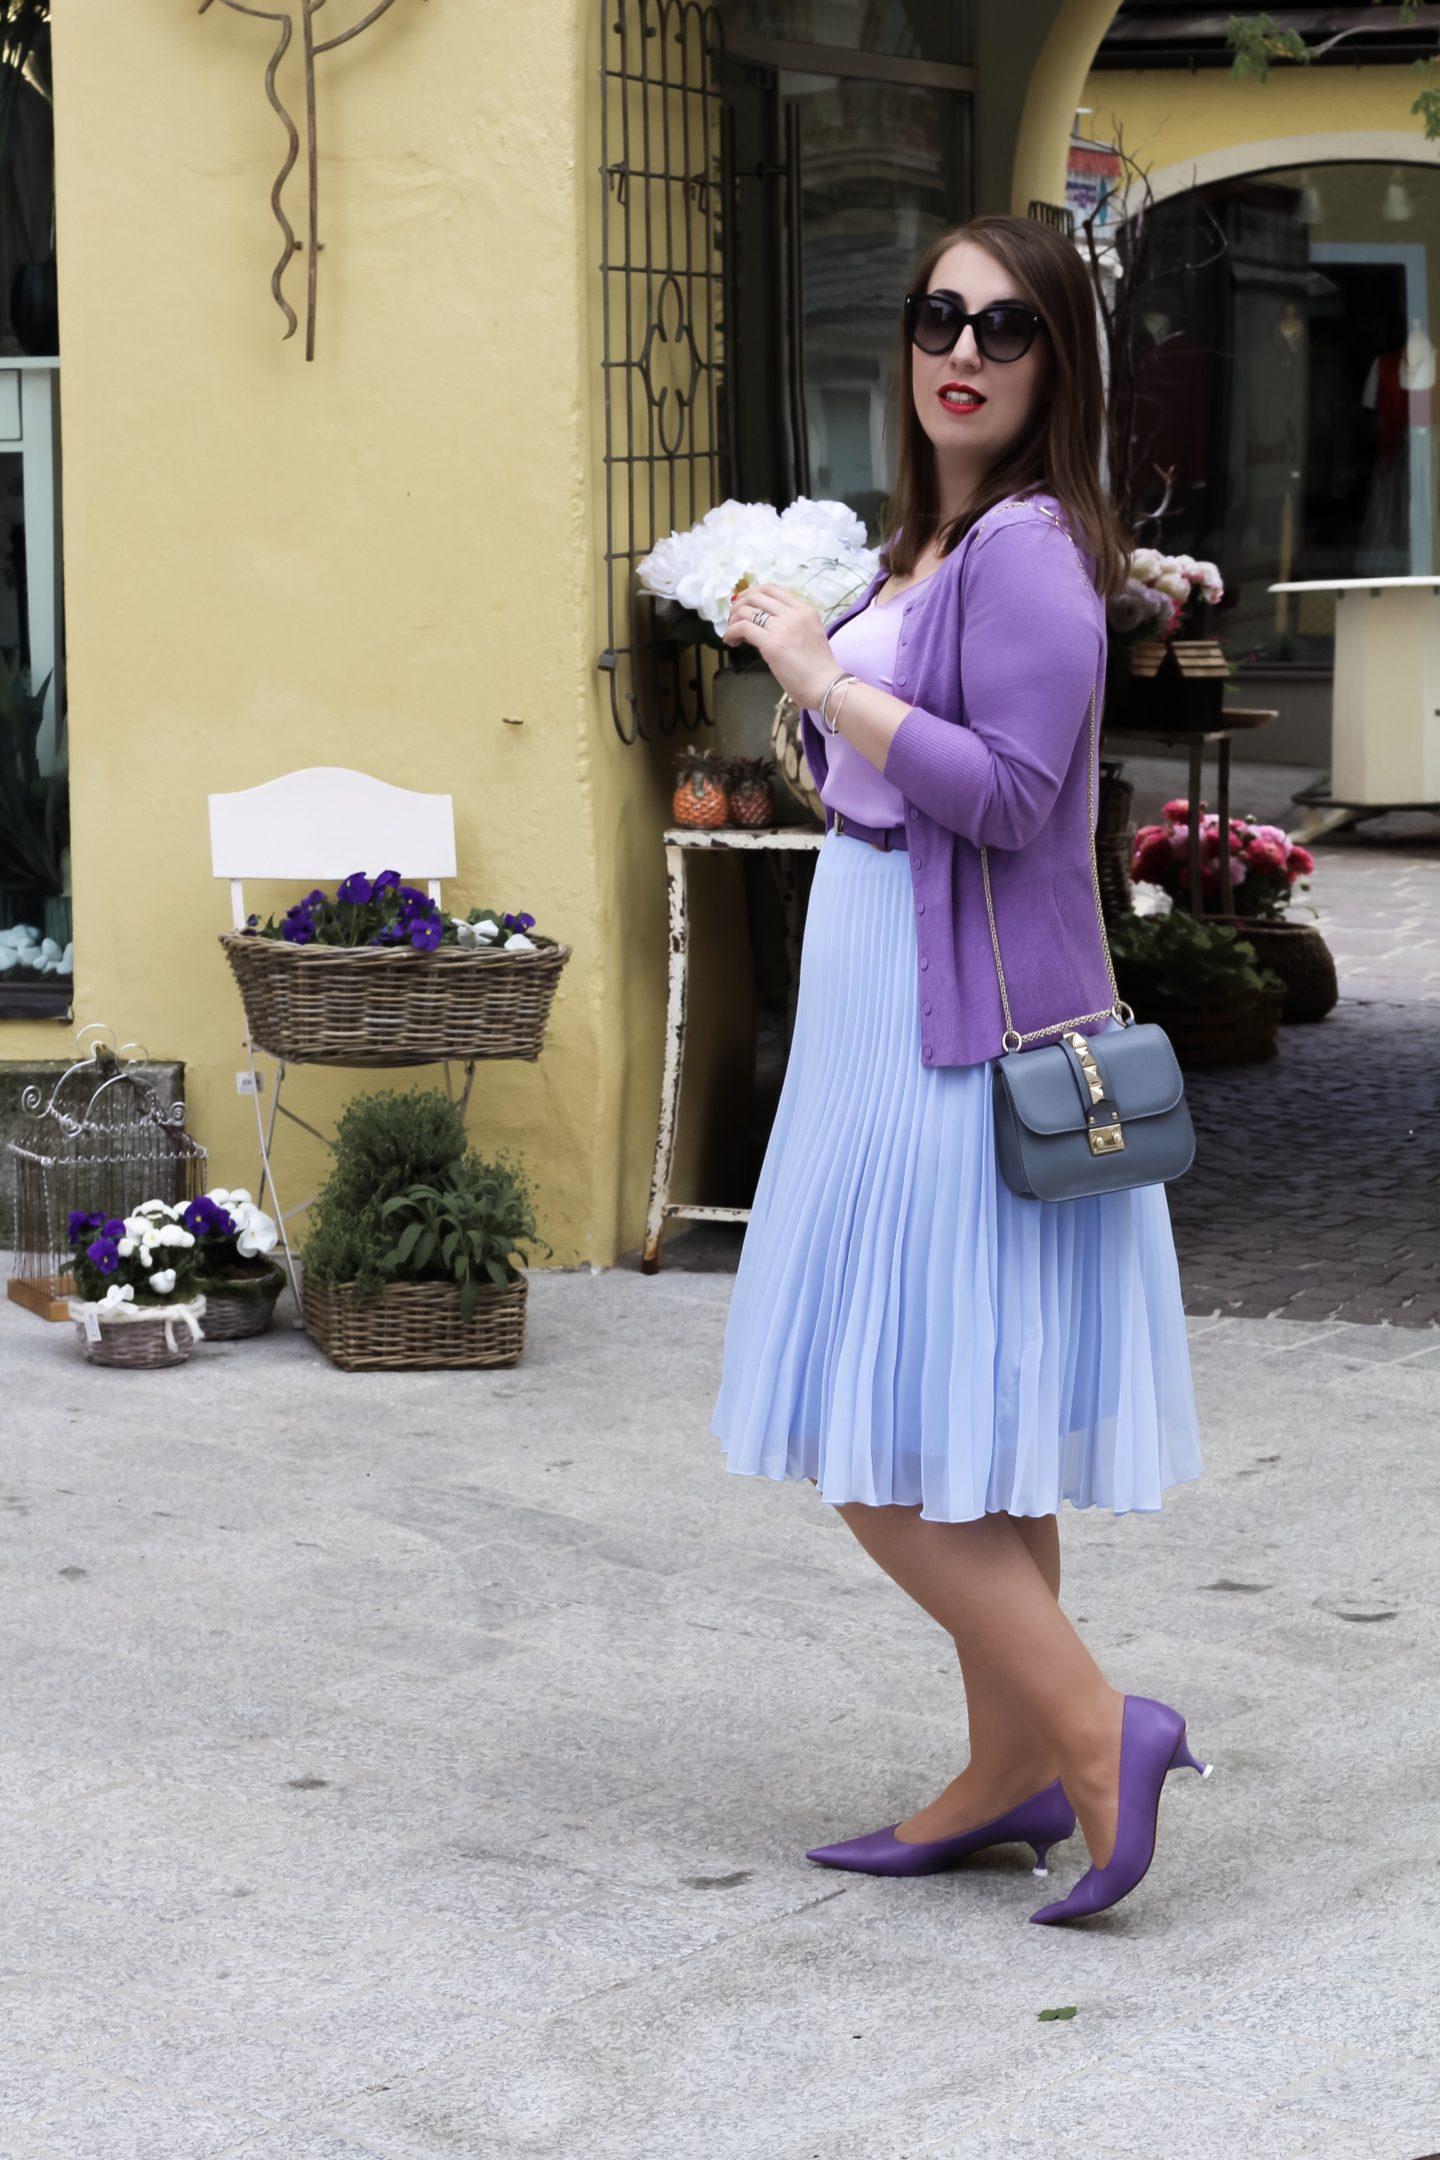 Miss-Suzie-Loves-Sommer-Sorbet-Outfit-Pastell-Plisseerock-kombinieren-Flieder-Susanne-Heidebach-Valentino-Rockstud-Kitzbuehel-Fashionblogger-Curvyblogger-Germanblogger